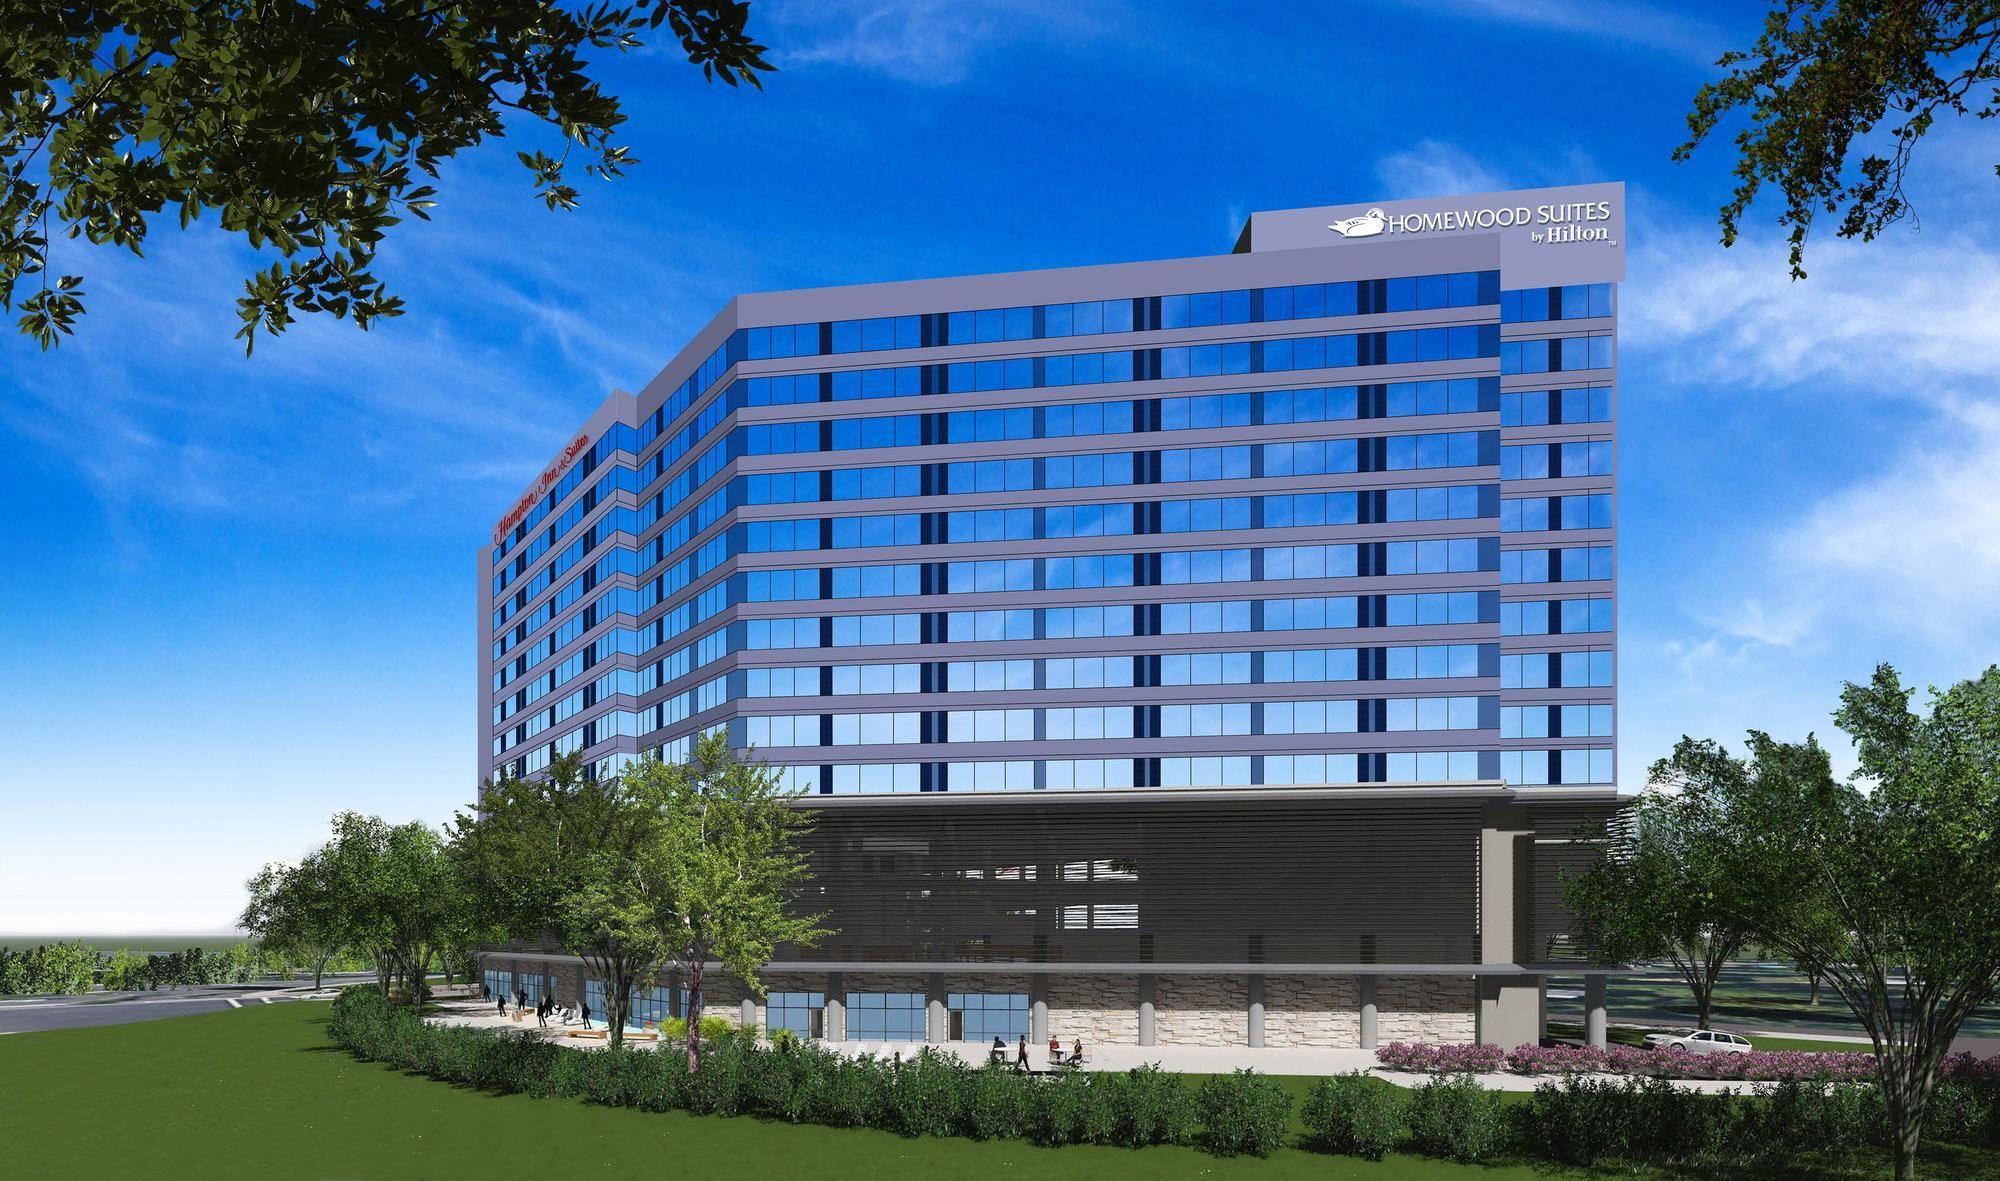 Hotel en Nueva York Homewood Suites by Hilton Teaneck Glenpointe